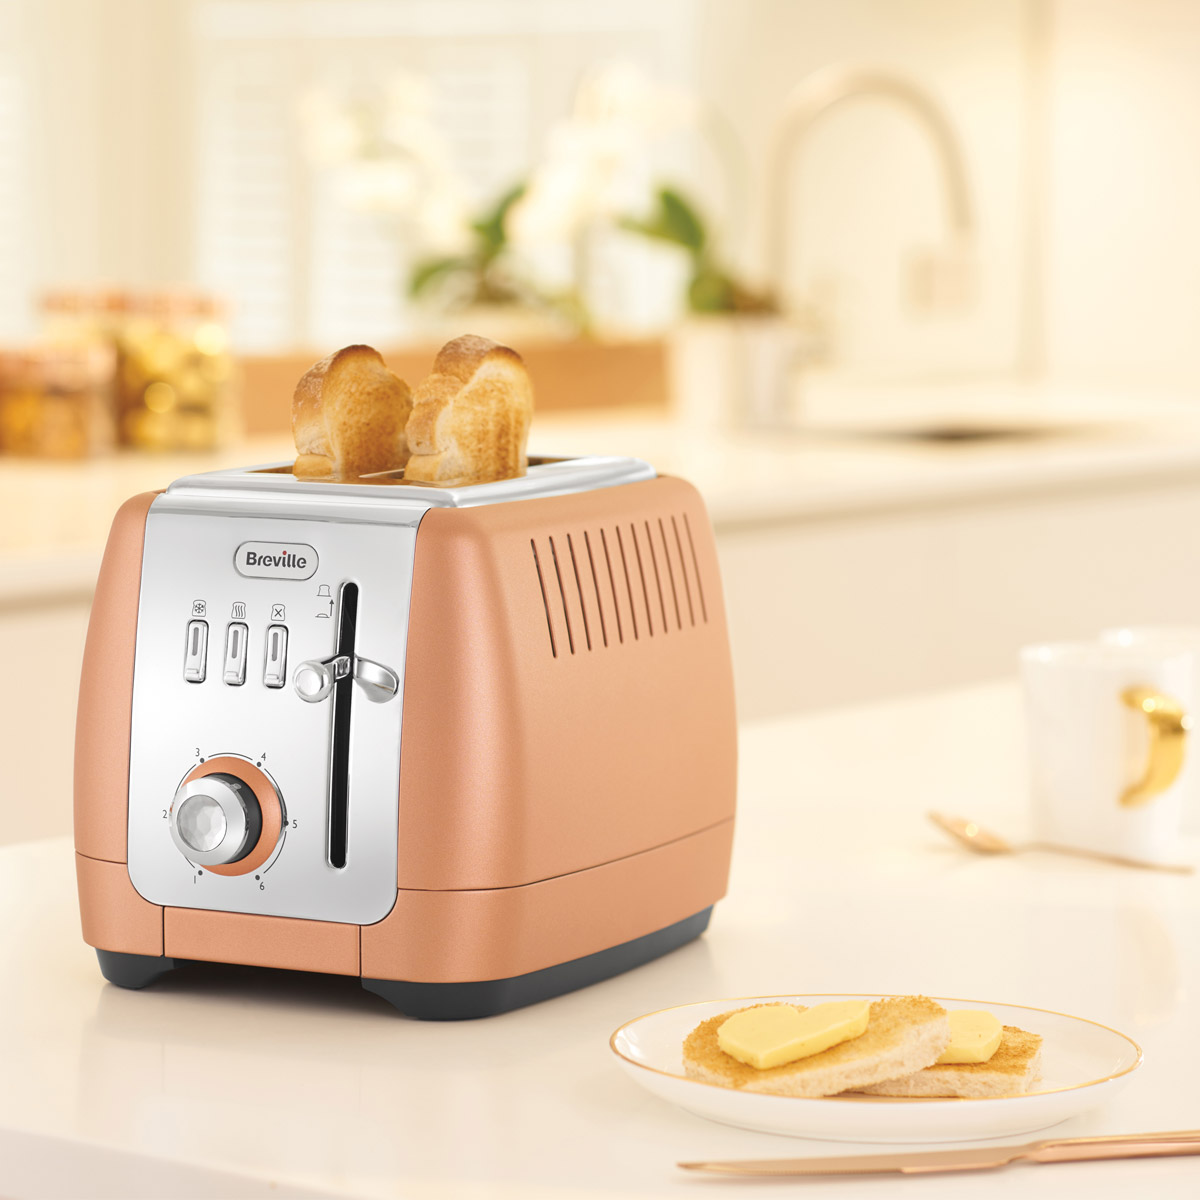 Strata Luminere 2 Slice Toaster Breville